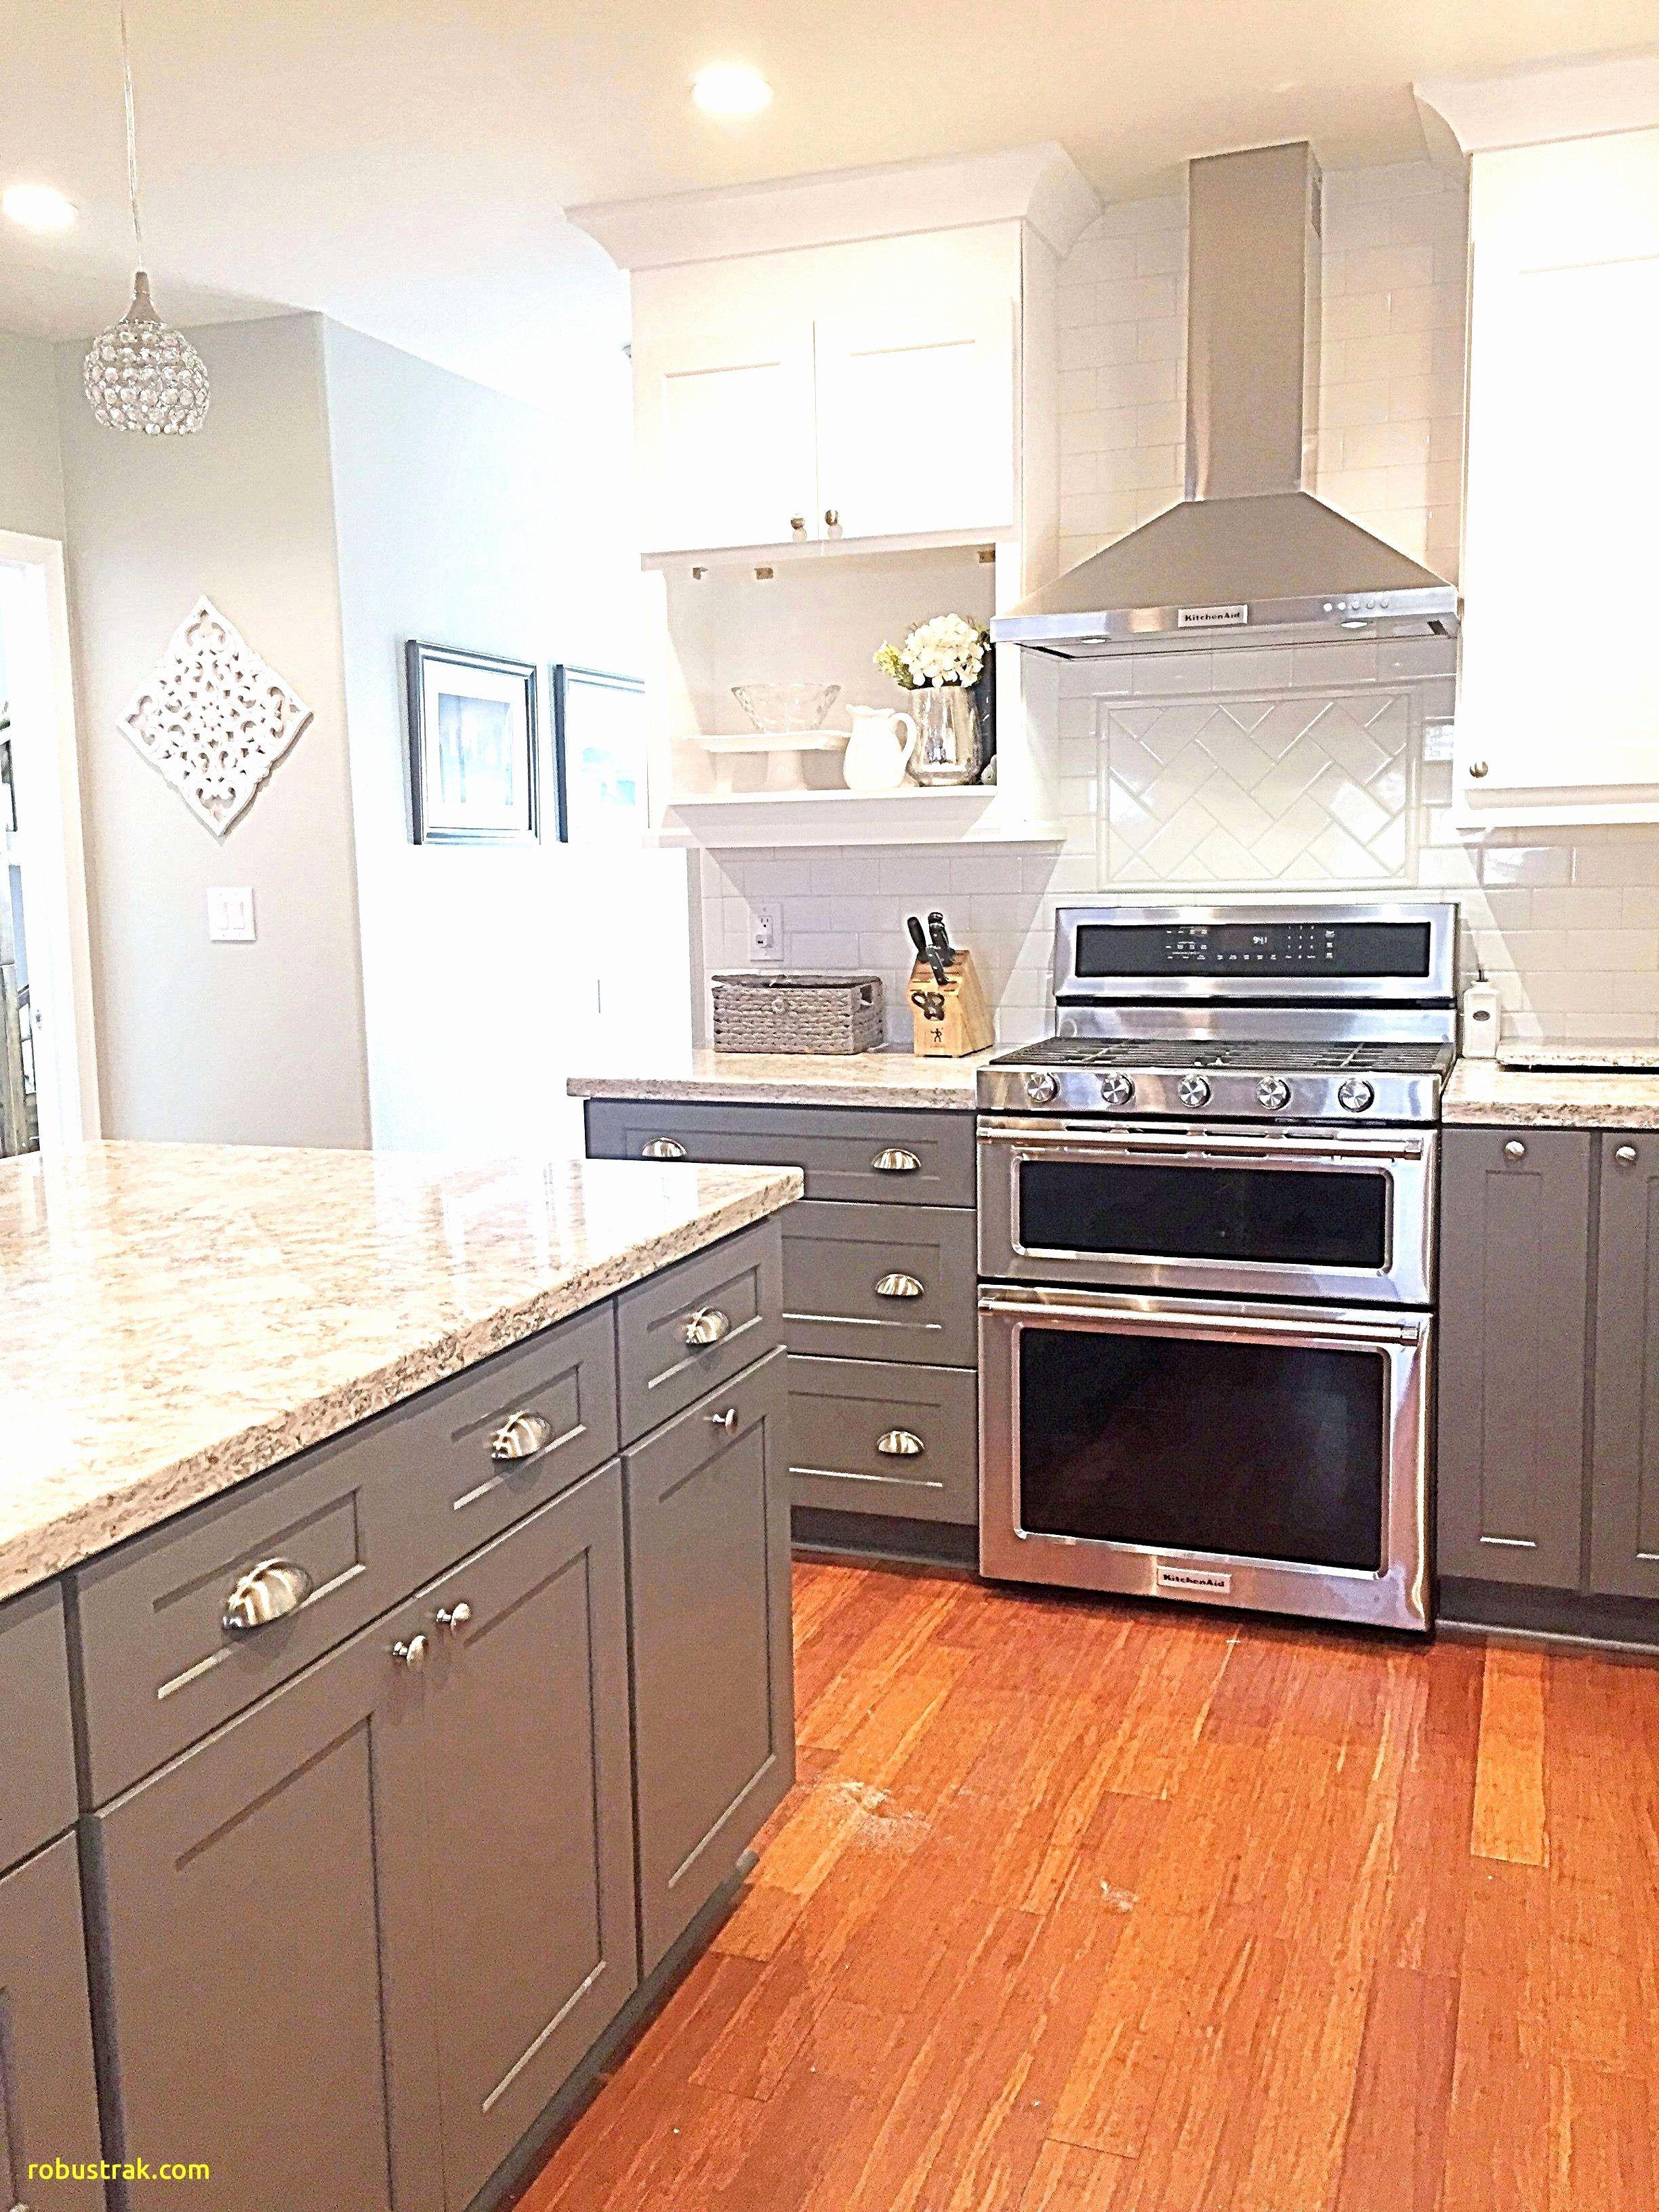 Pin by jenifer dun on ceramic floor tiles ideas in kitchen